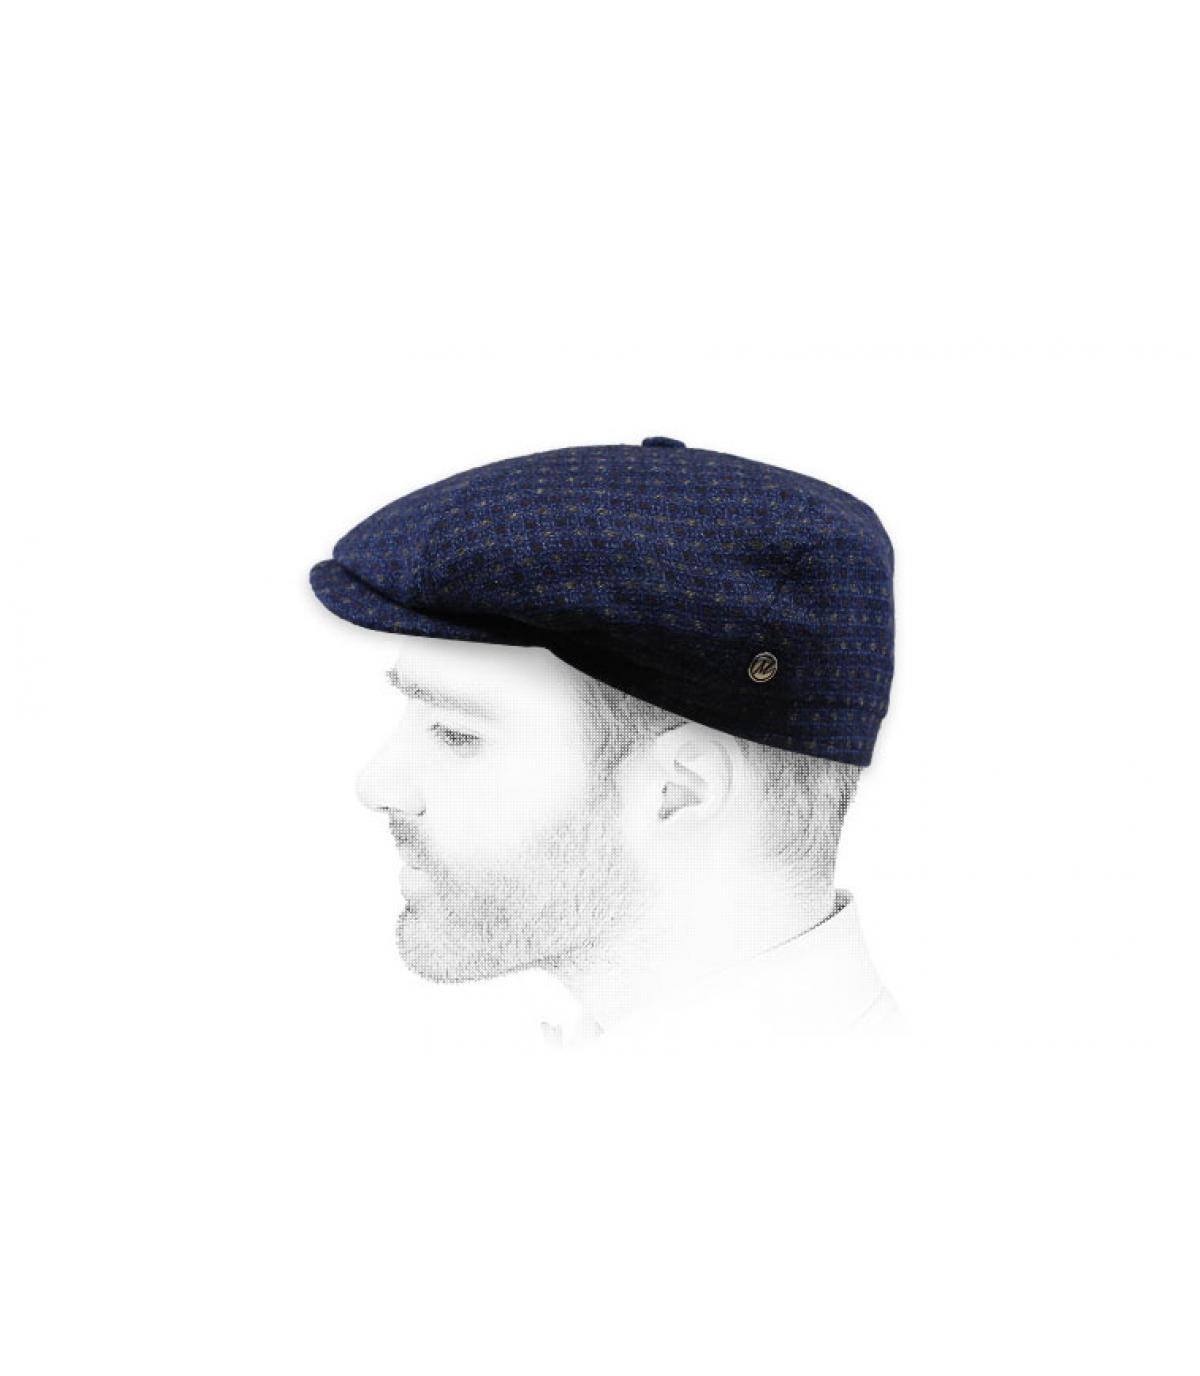 berretto in lana cashmere blu navy